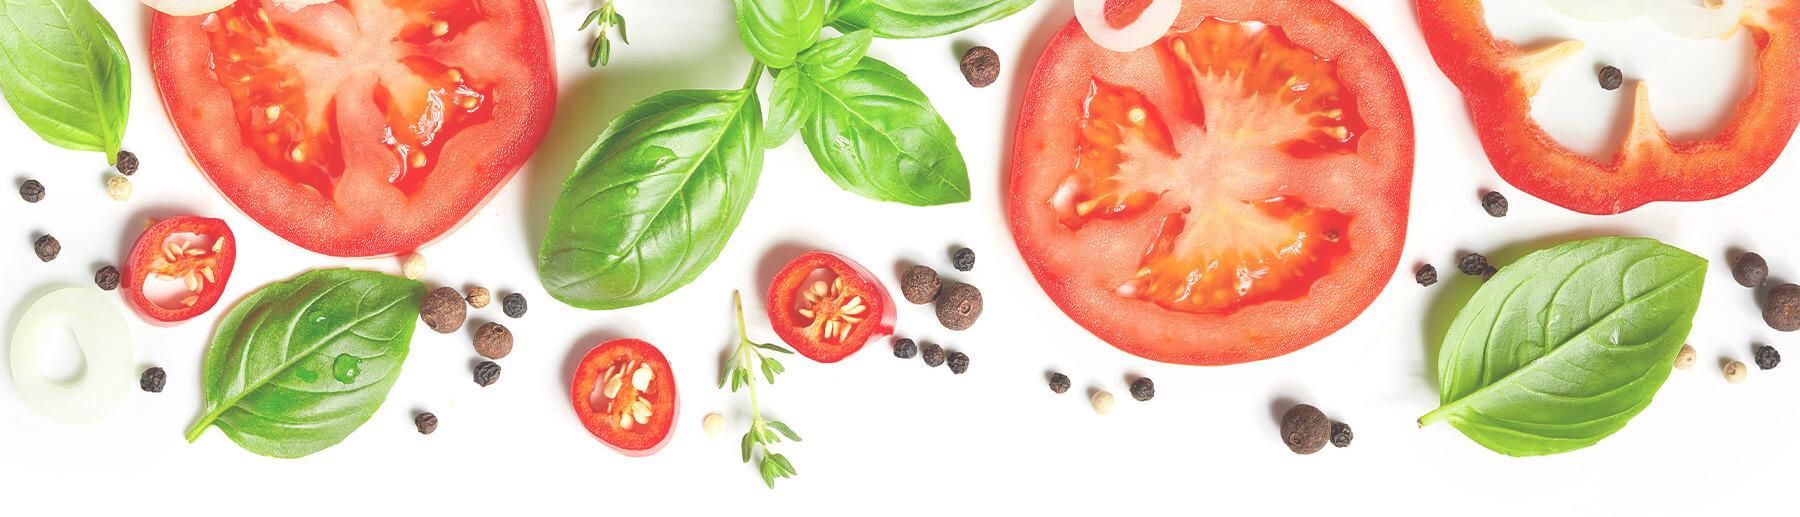 tomato slices & basil